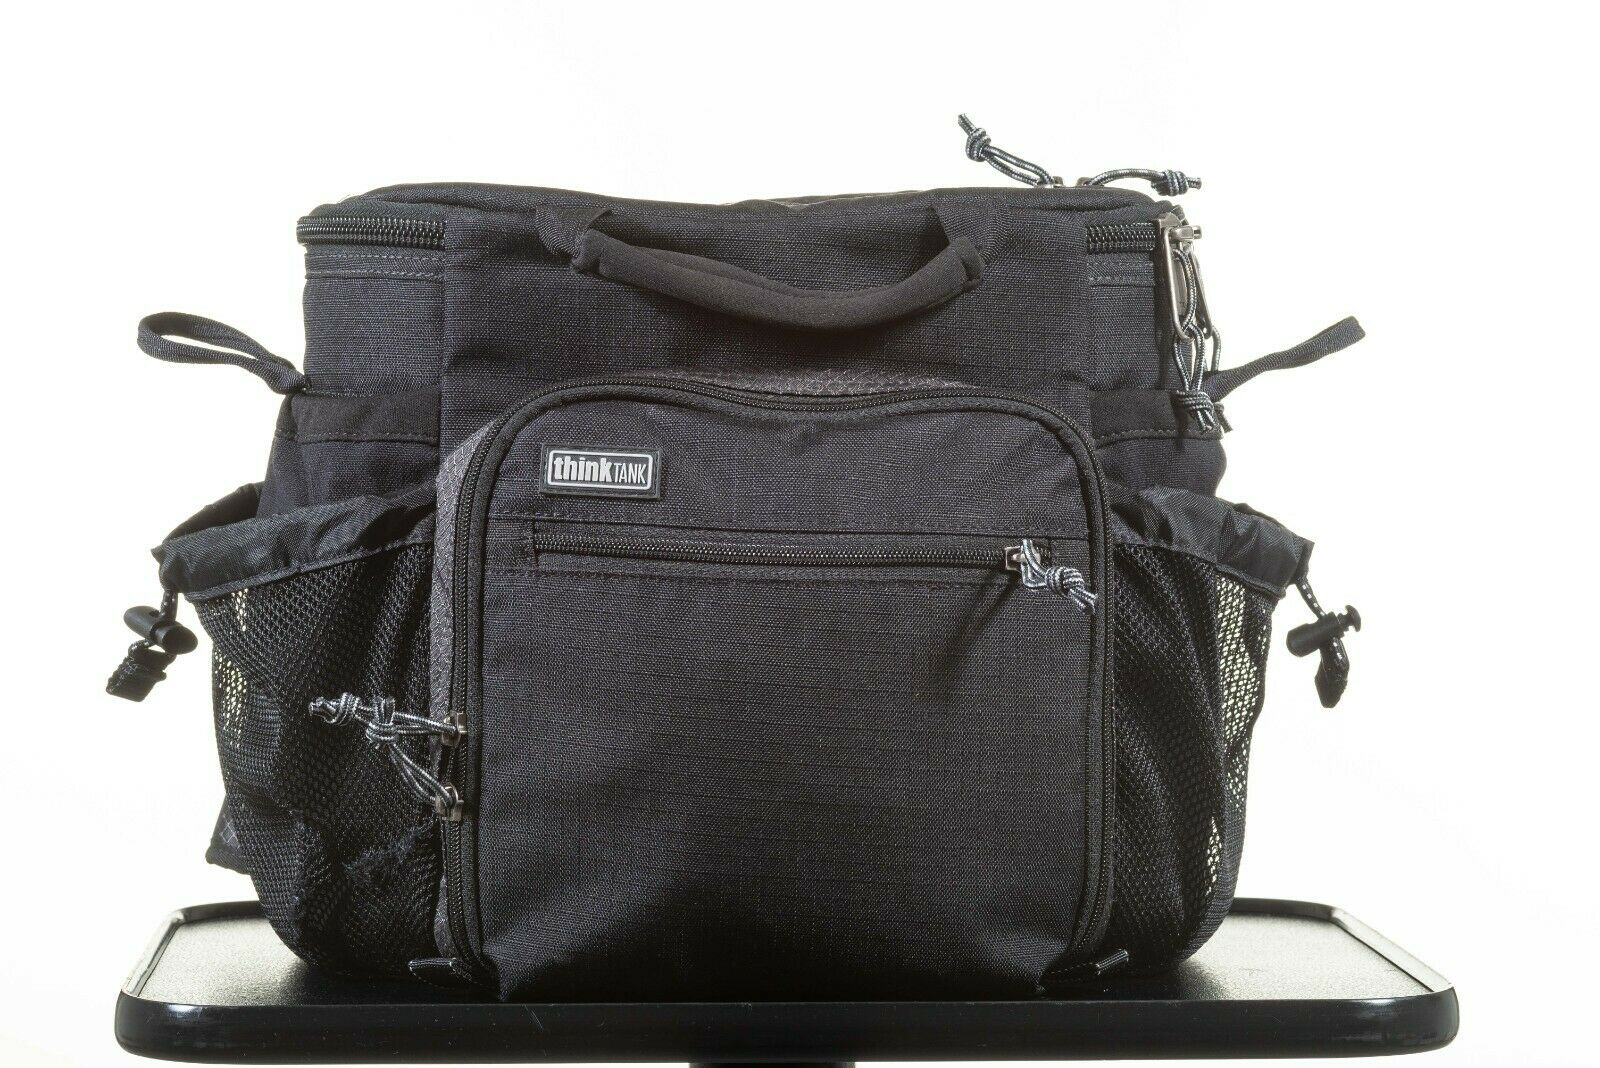 Think Tank Speed Racer camera bag with shoulder strap and waist belt clip